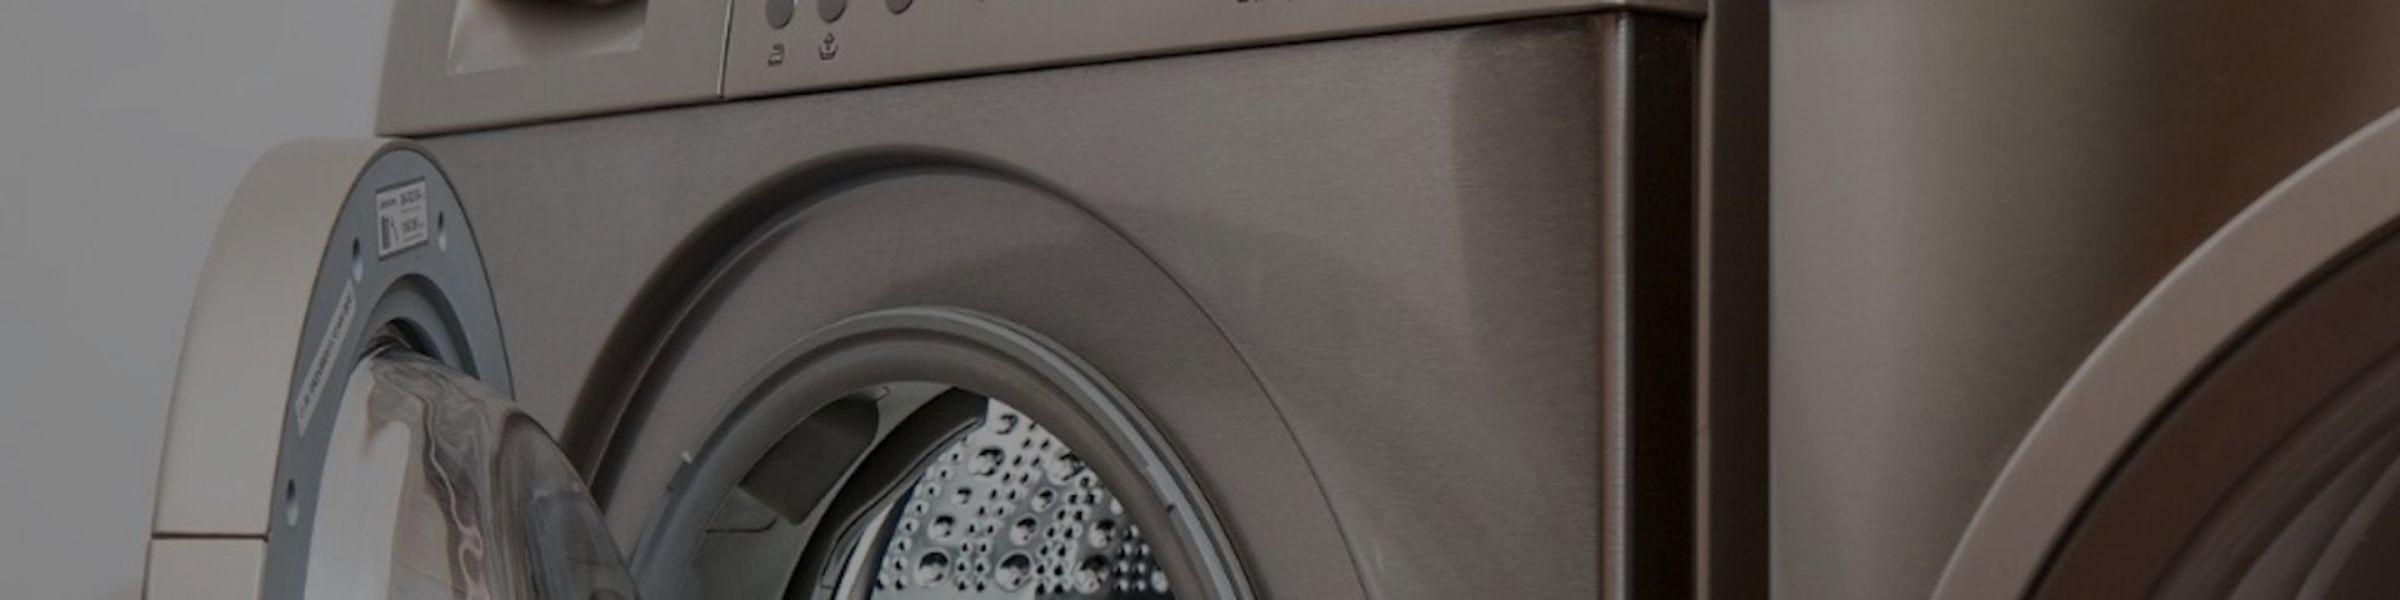 washing machine repairs pros in Kempton Park